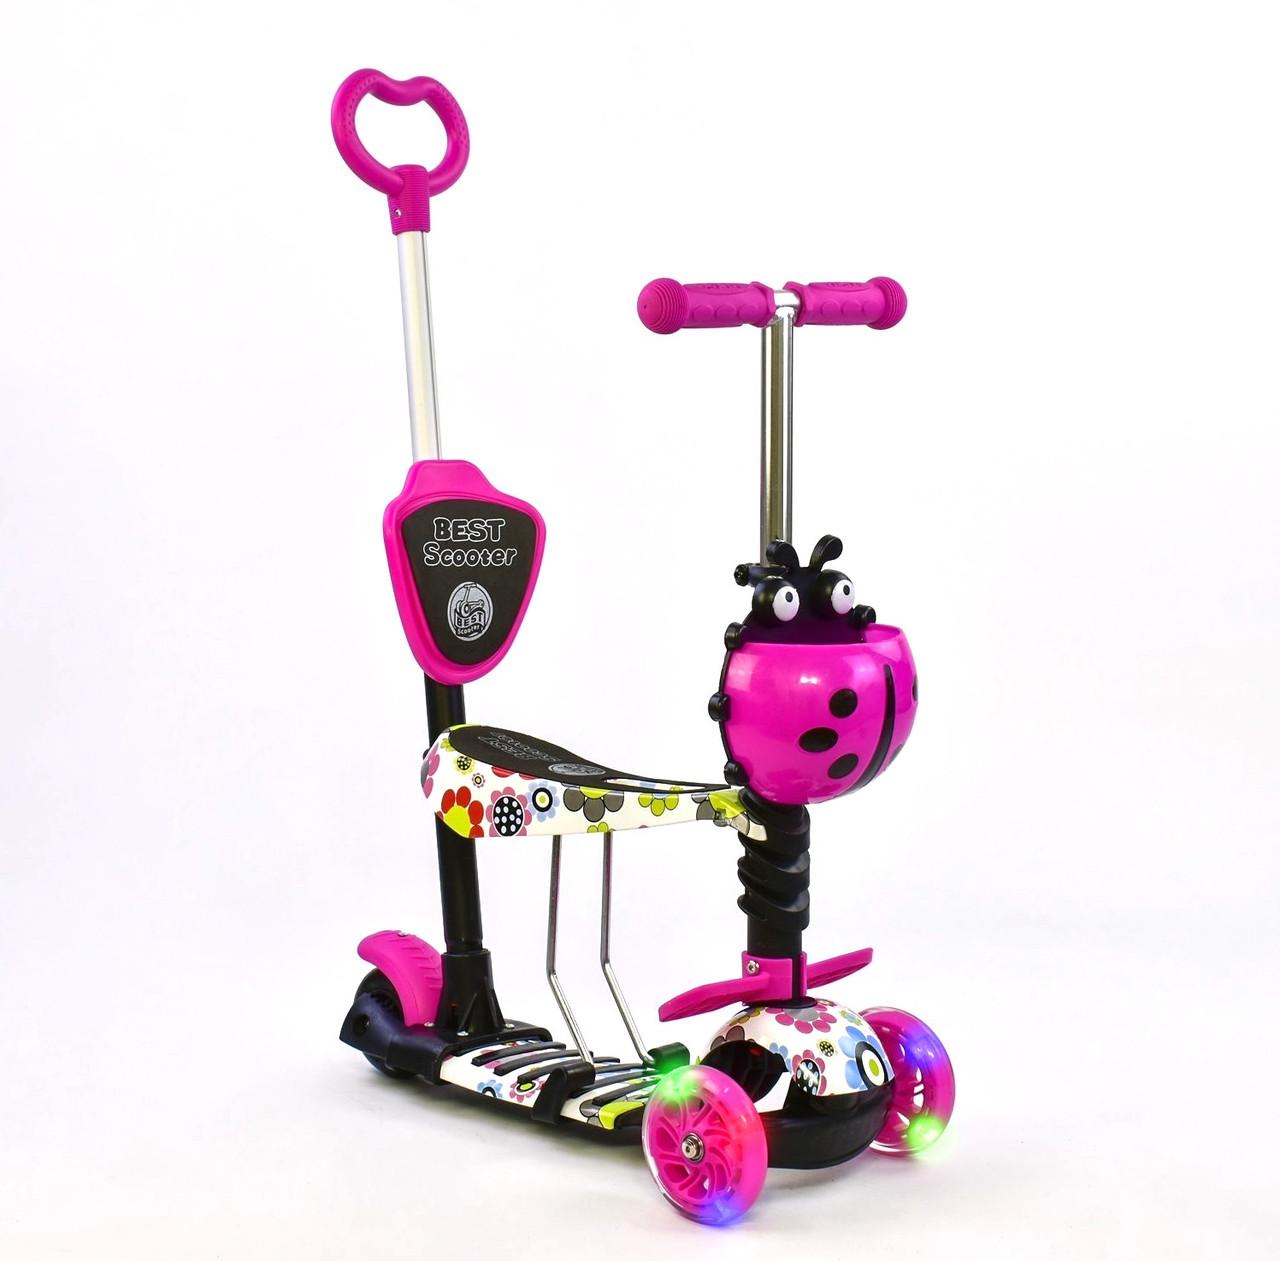 Детский самокат 5в1 Best Scooter 74230